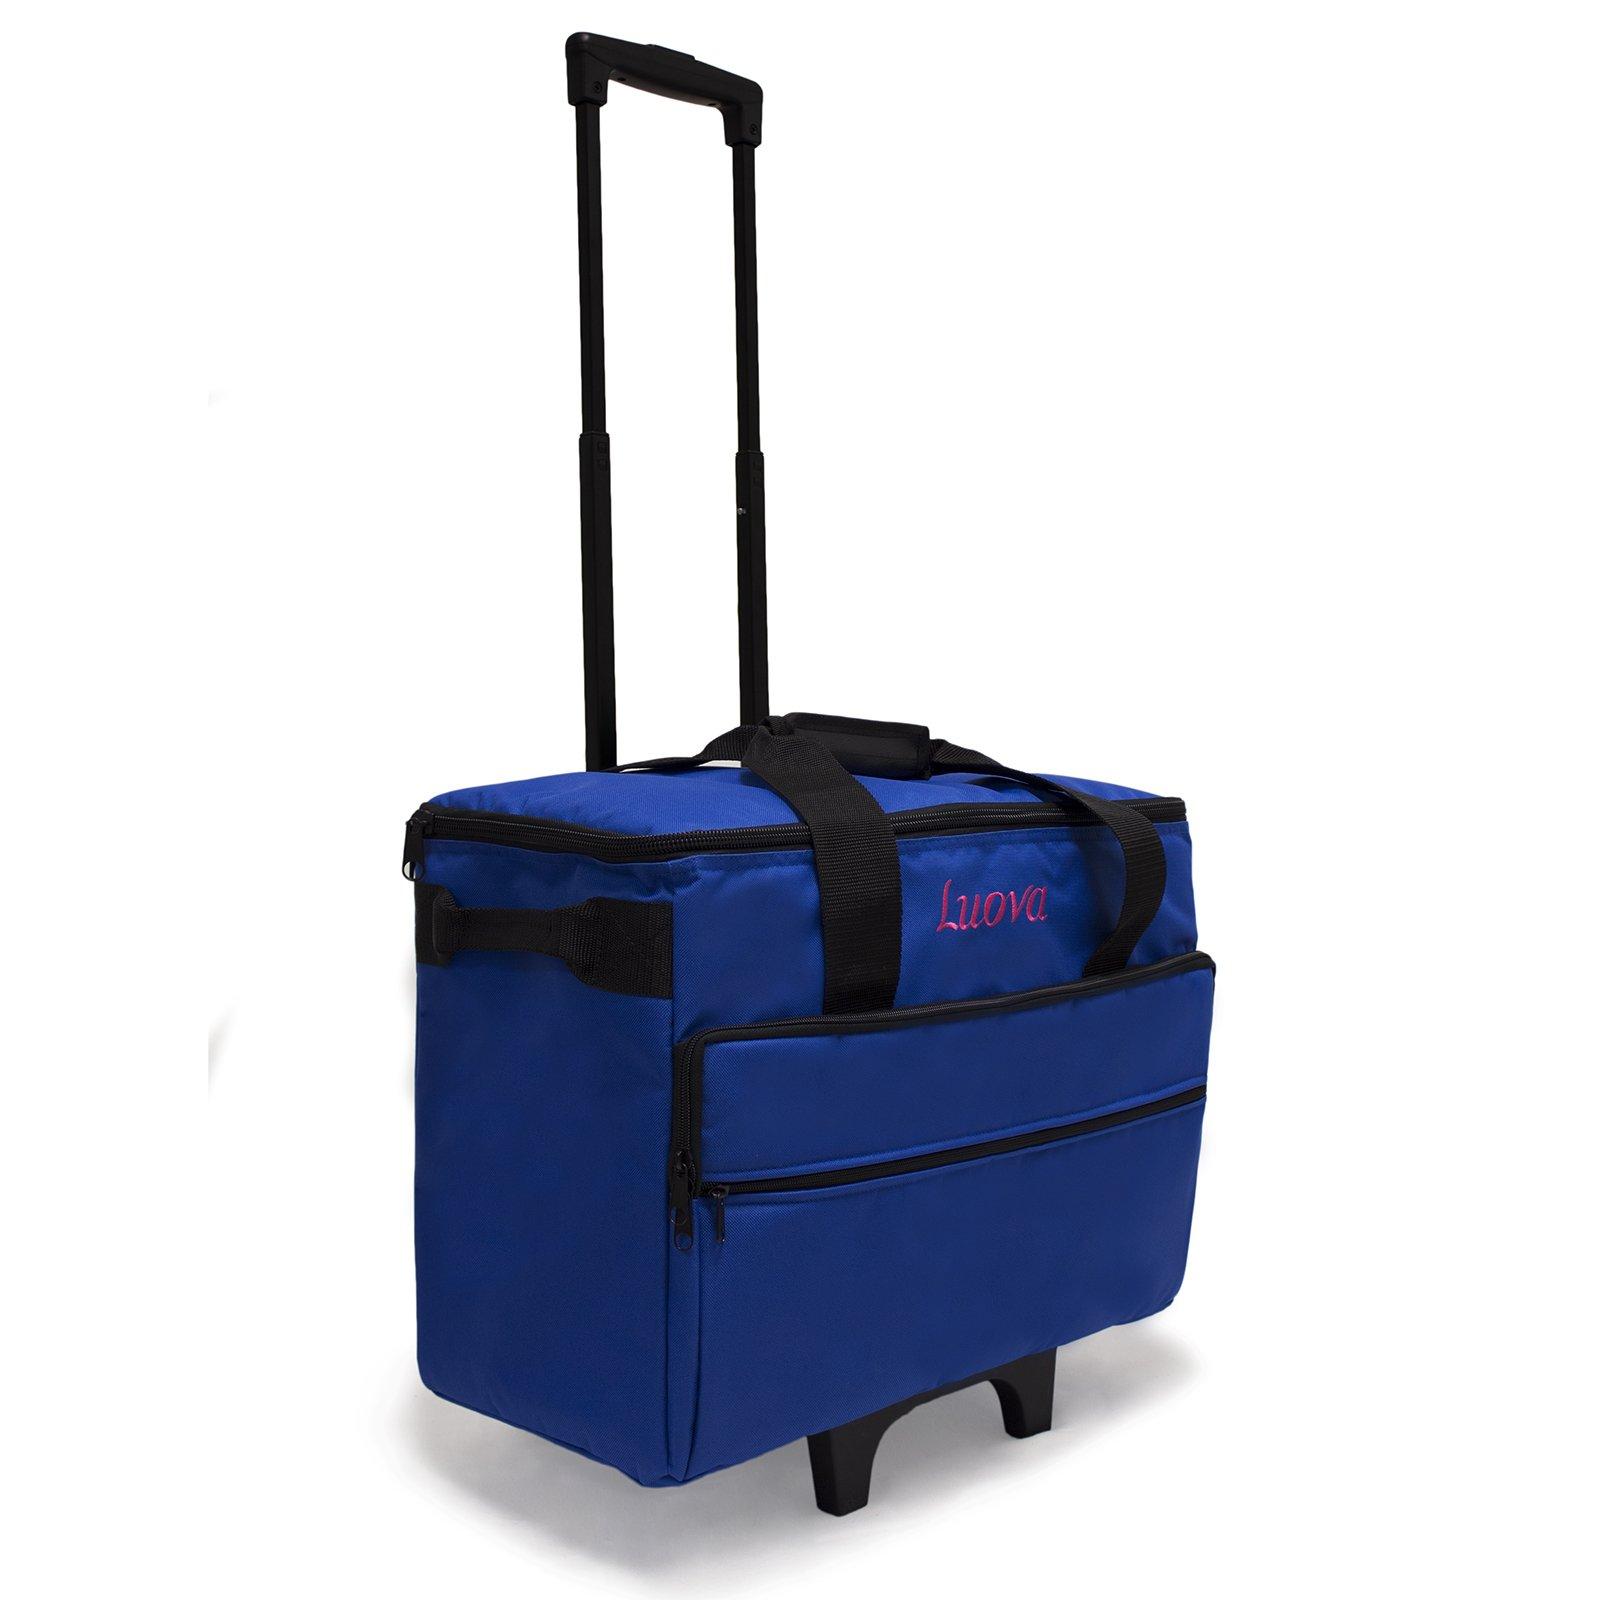 Luova 19'' Rolling Sewing Machine Trolley in Cobalt Blue by Luova